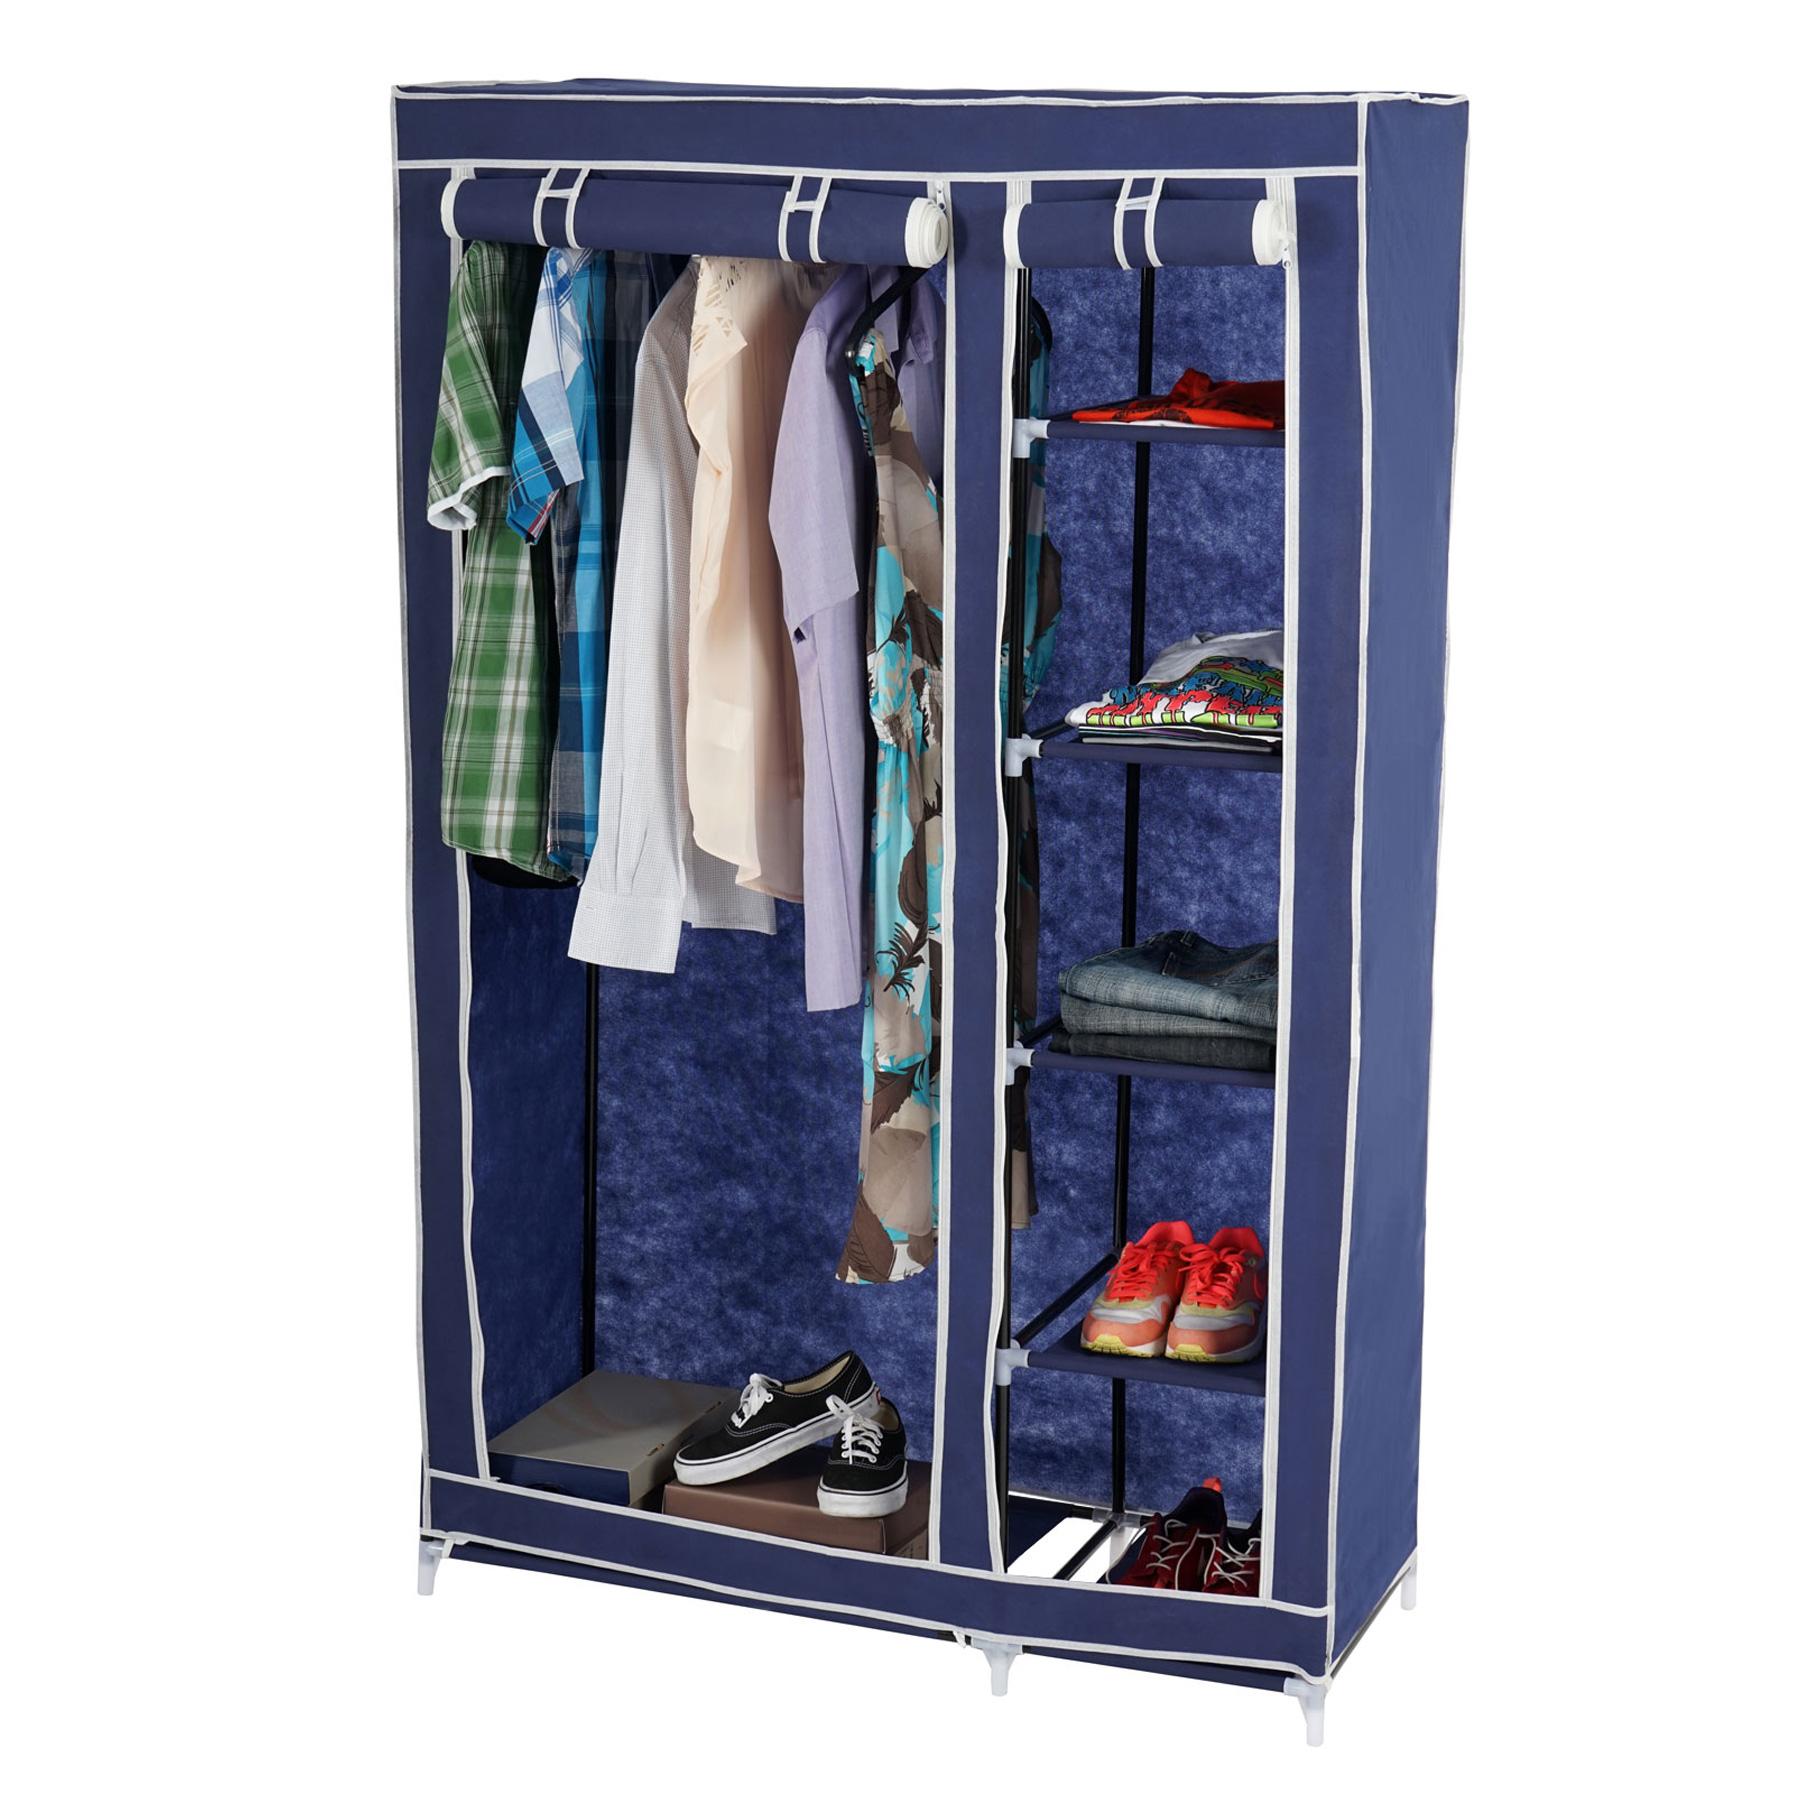 rot blau creme Faltschrank Campingschrank Stoffschrank Kleiderschrank